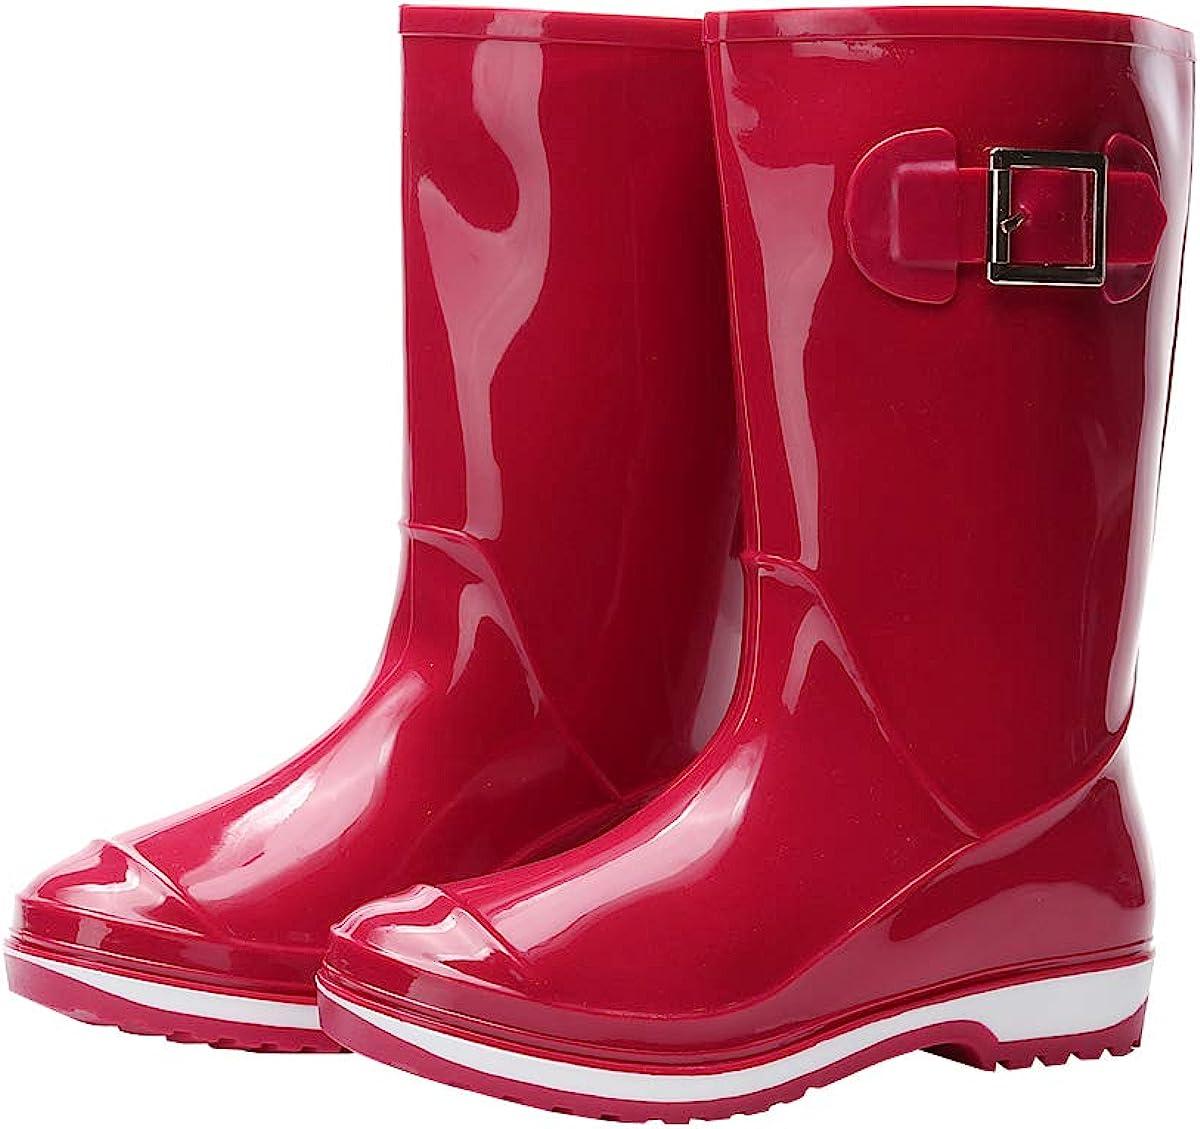 Kontai Women Half Calf Rubber Rainboots Waterproof Rubber for Garden Women rain Footwear